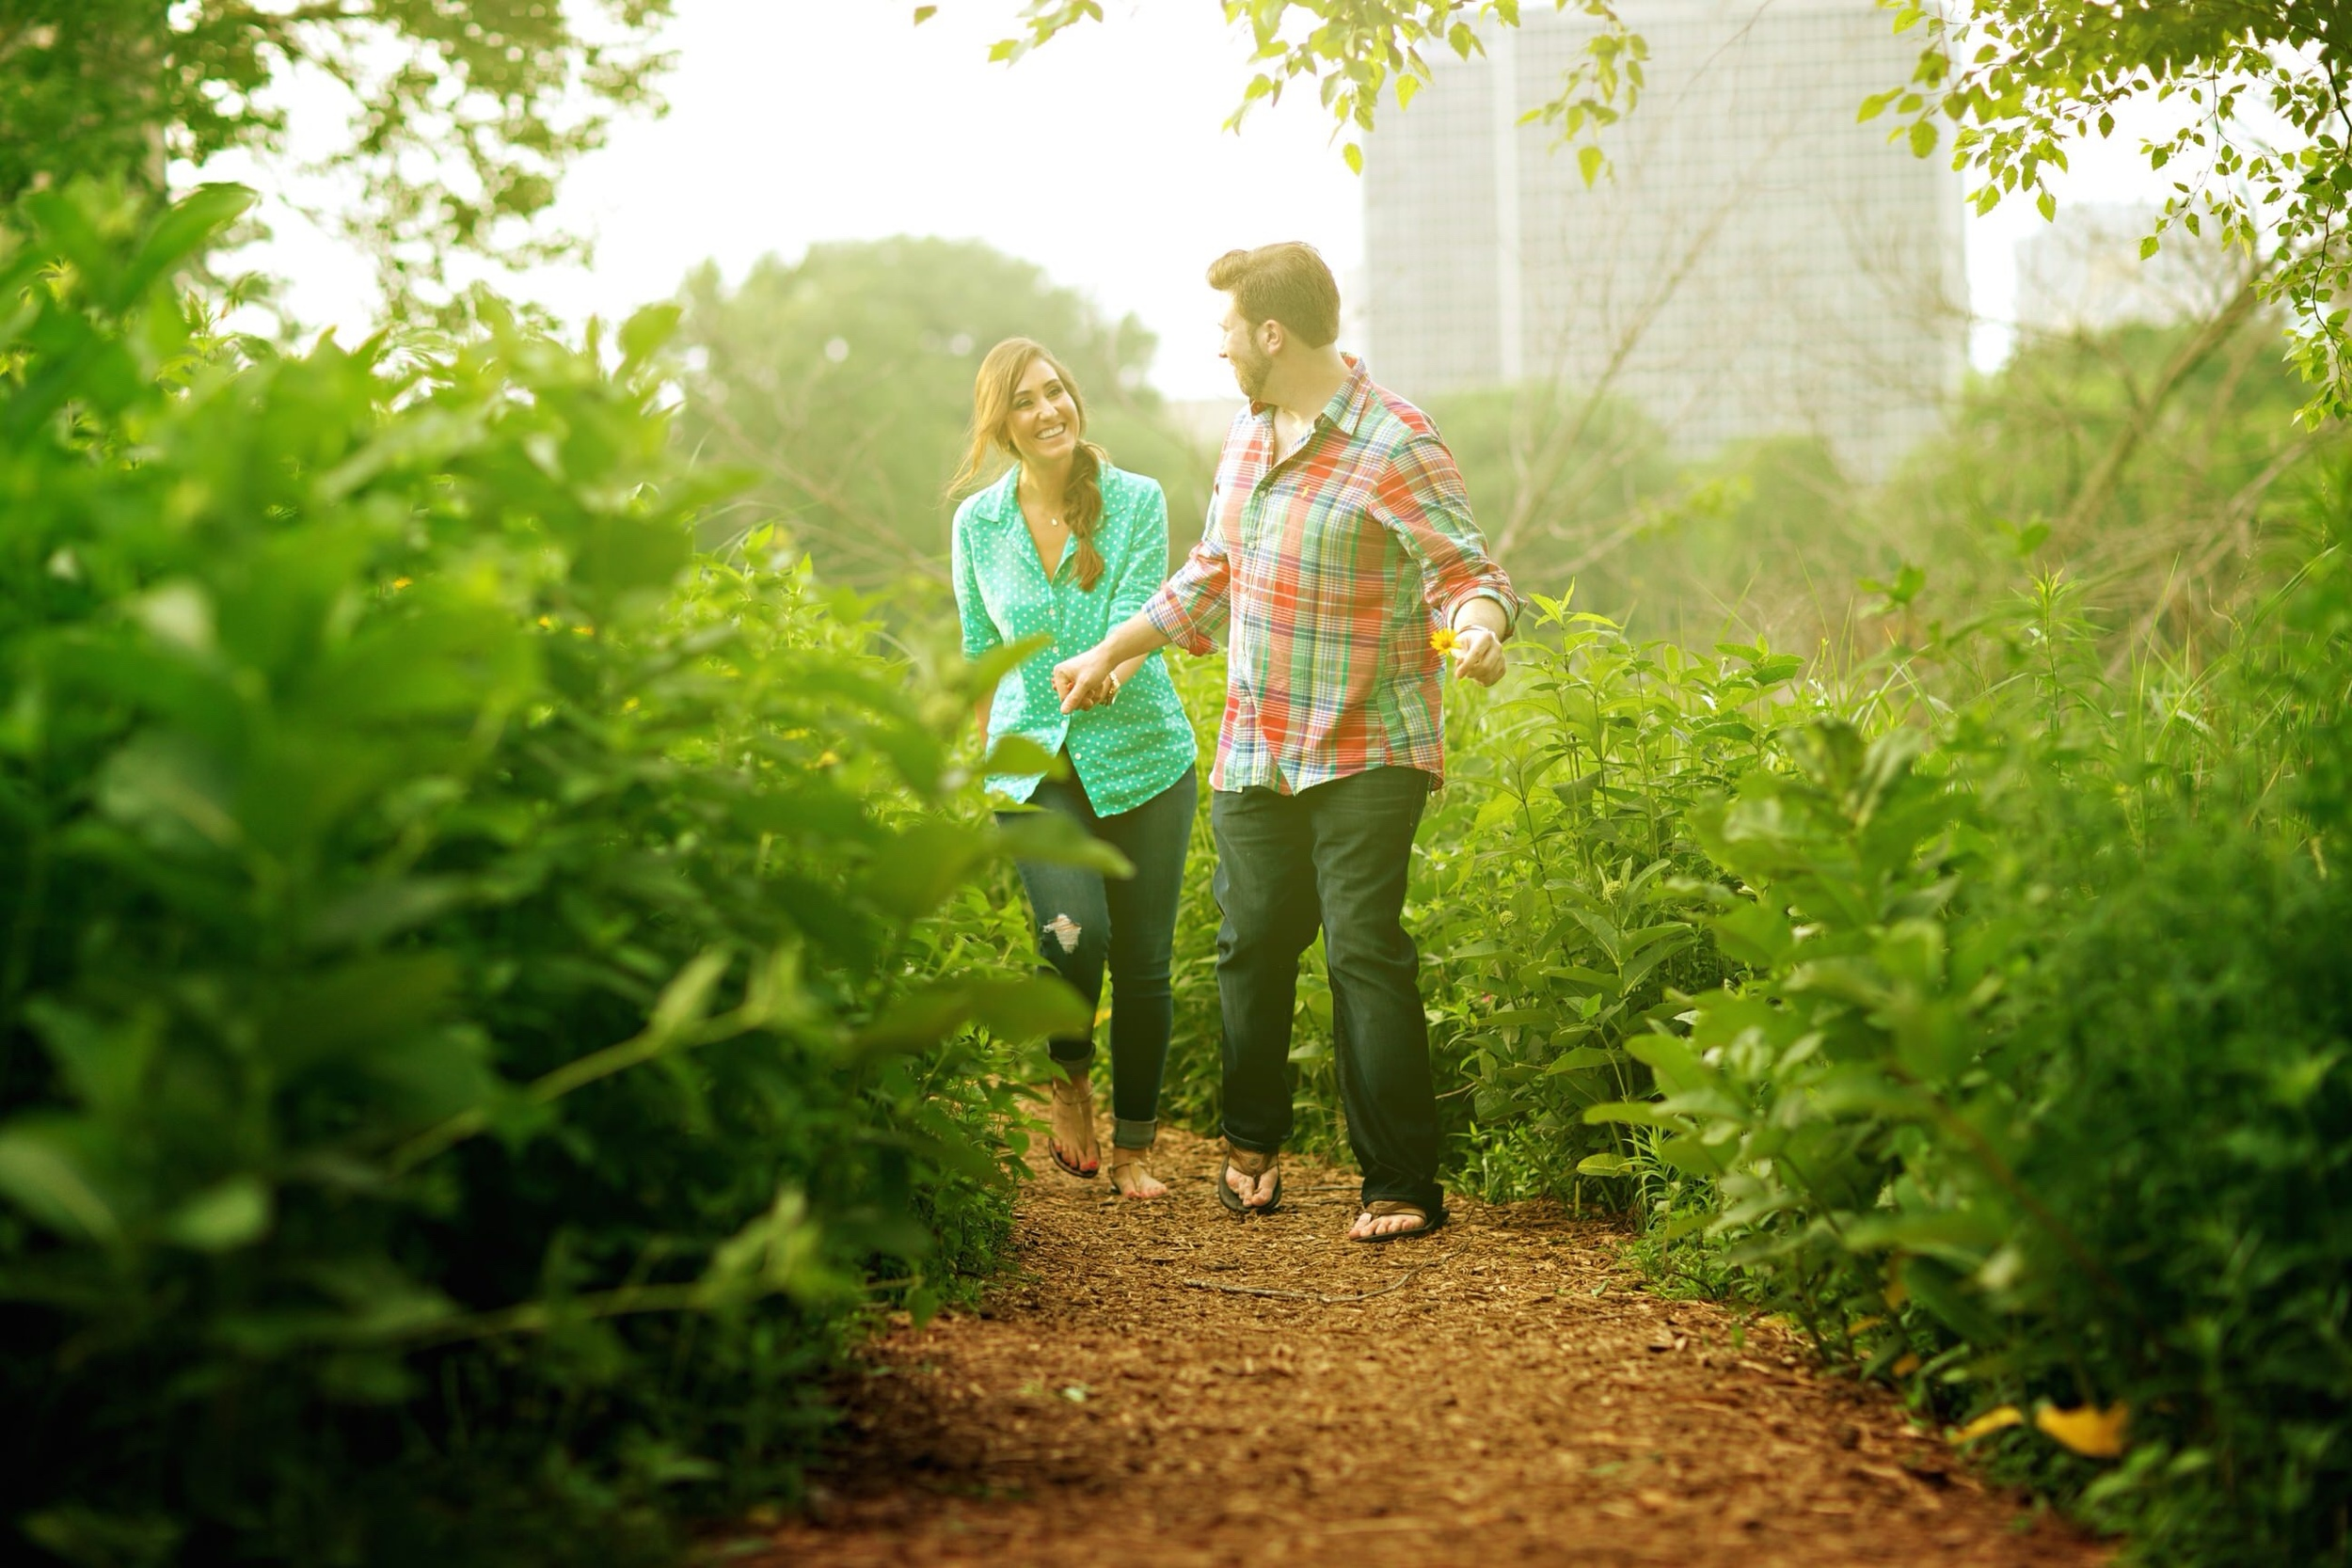 couple-walking-through-park-healthcare-advertisement.jpg